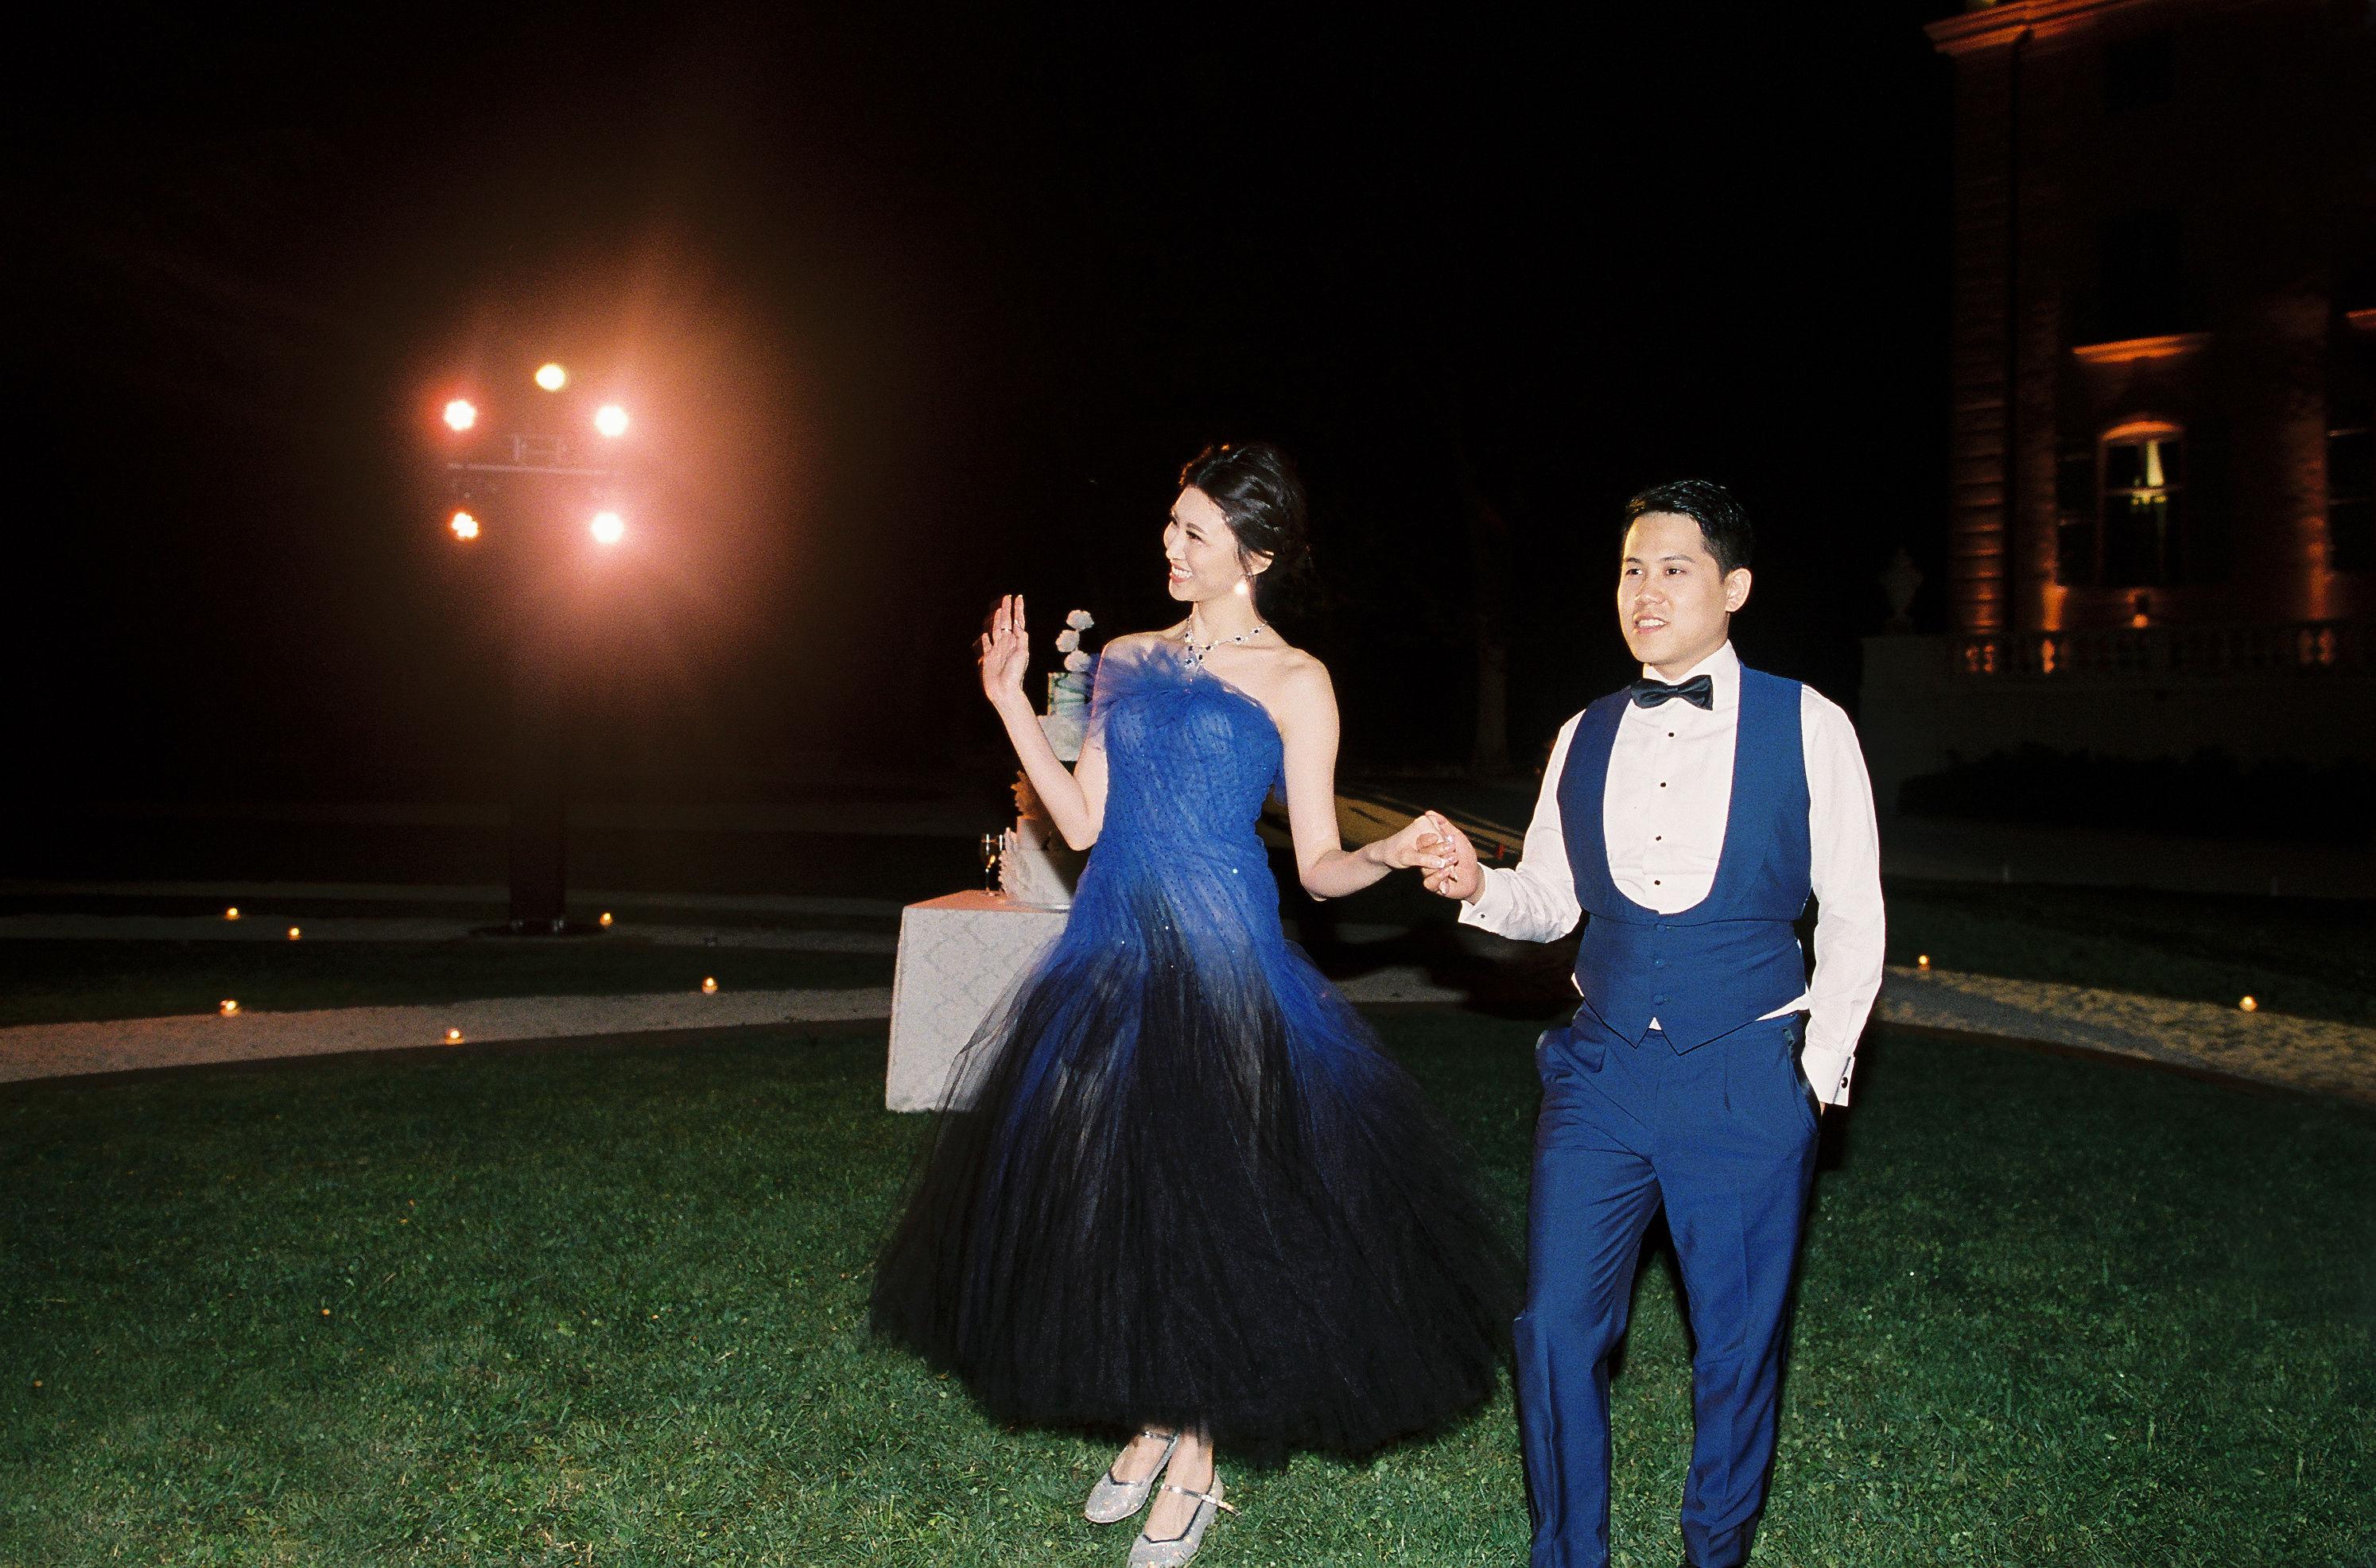 janet patrick wedding reception dress blue